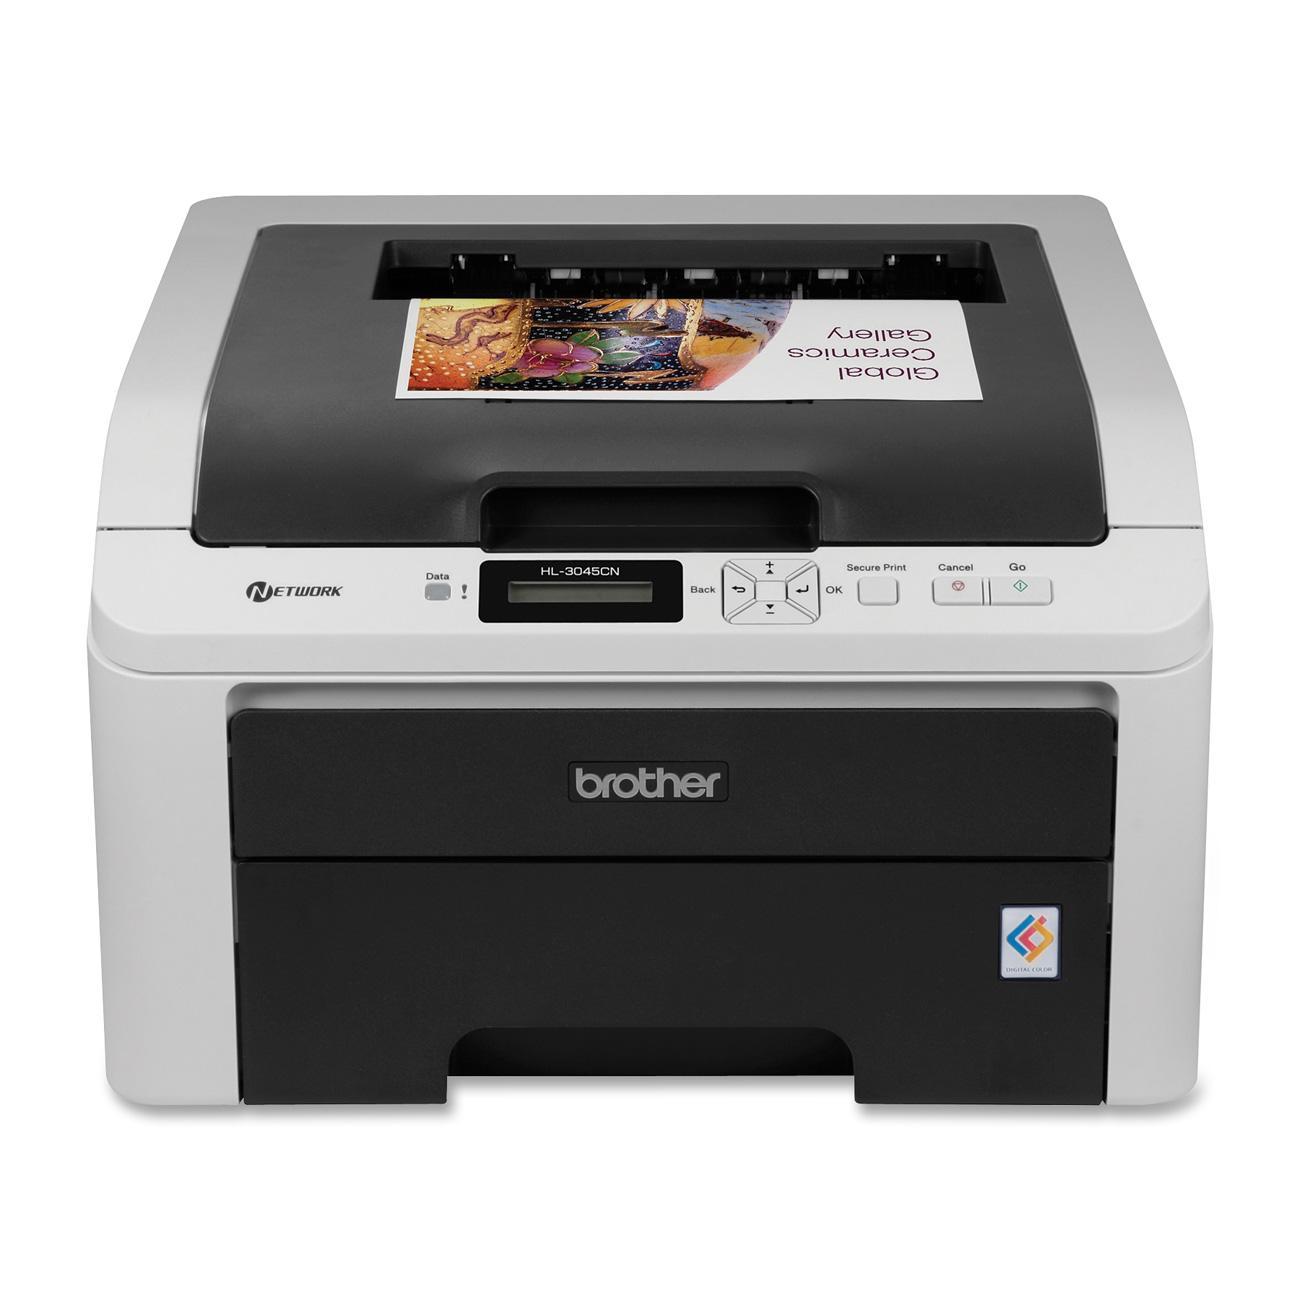 Brother HL-3045CN LED Printer - Color - 2400 x 600 dpi Print - Plain Paper  Print - Desktop - 19 ppm Mono / 19 ppm Color Print - 250 sheets Standard